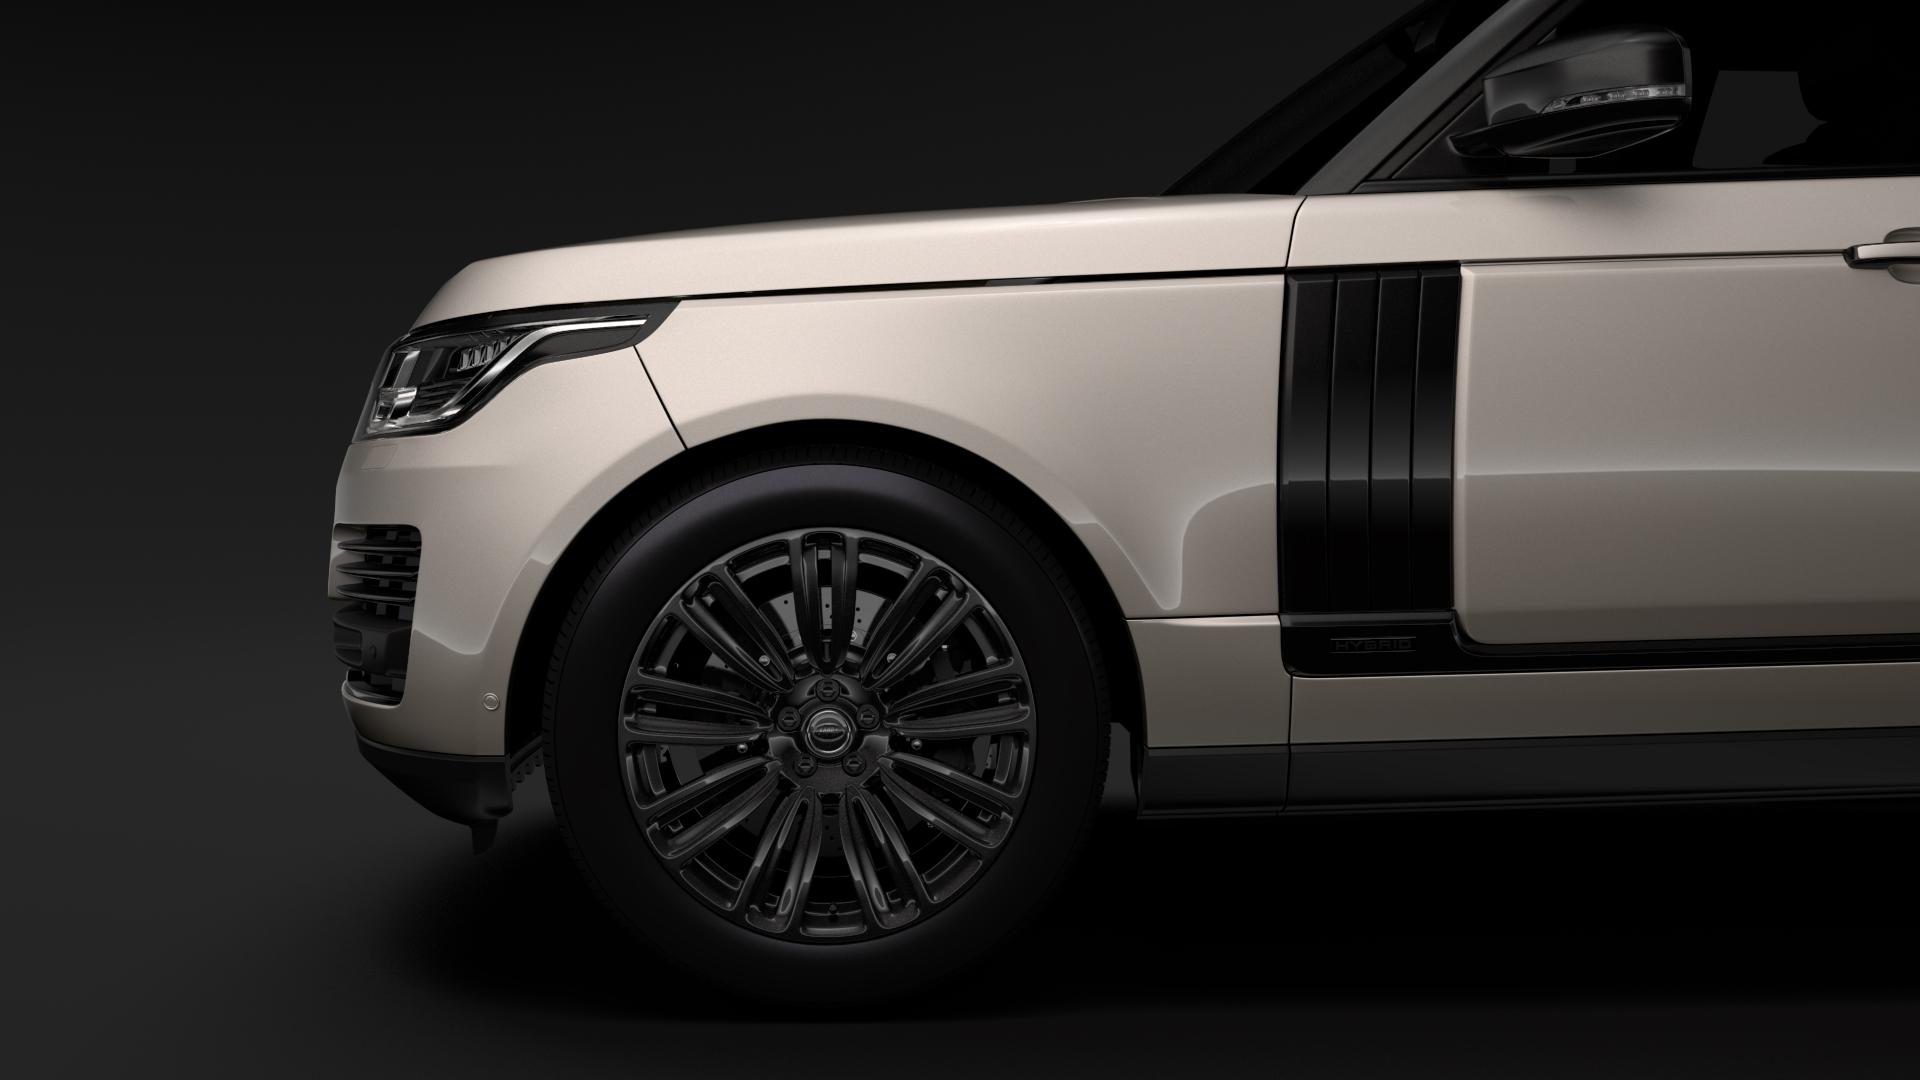 range rover autobiography hybrid (l405) 2018 3d model max fbx c4d lwo ma mb hrc xsi obj 278150